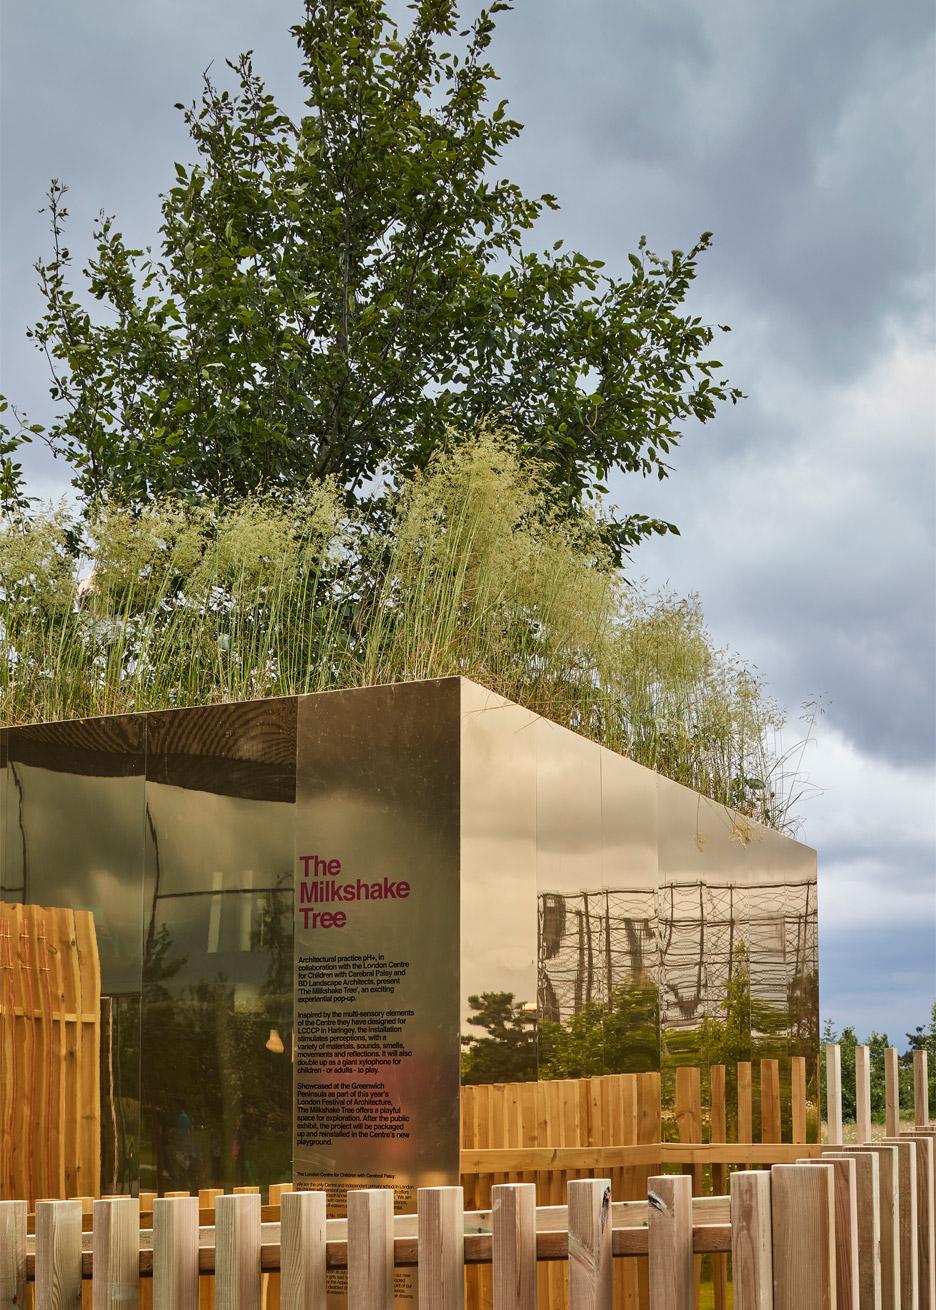 the-milkshake-tree-ph+-london-festival-architecture-2016-sensory-pavilion-cerebral-palsy-greenwich-london-uk-paul-raftery_dezeen_936_1